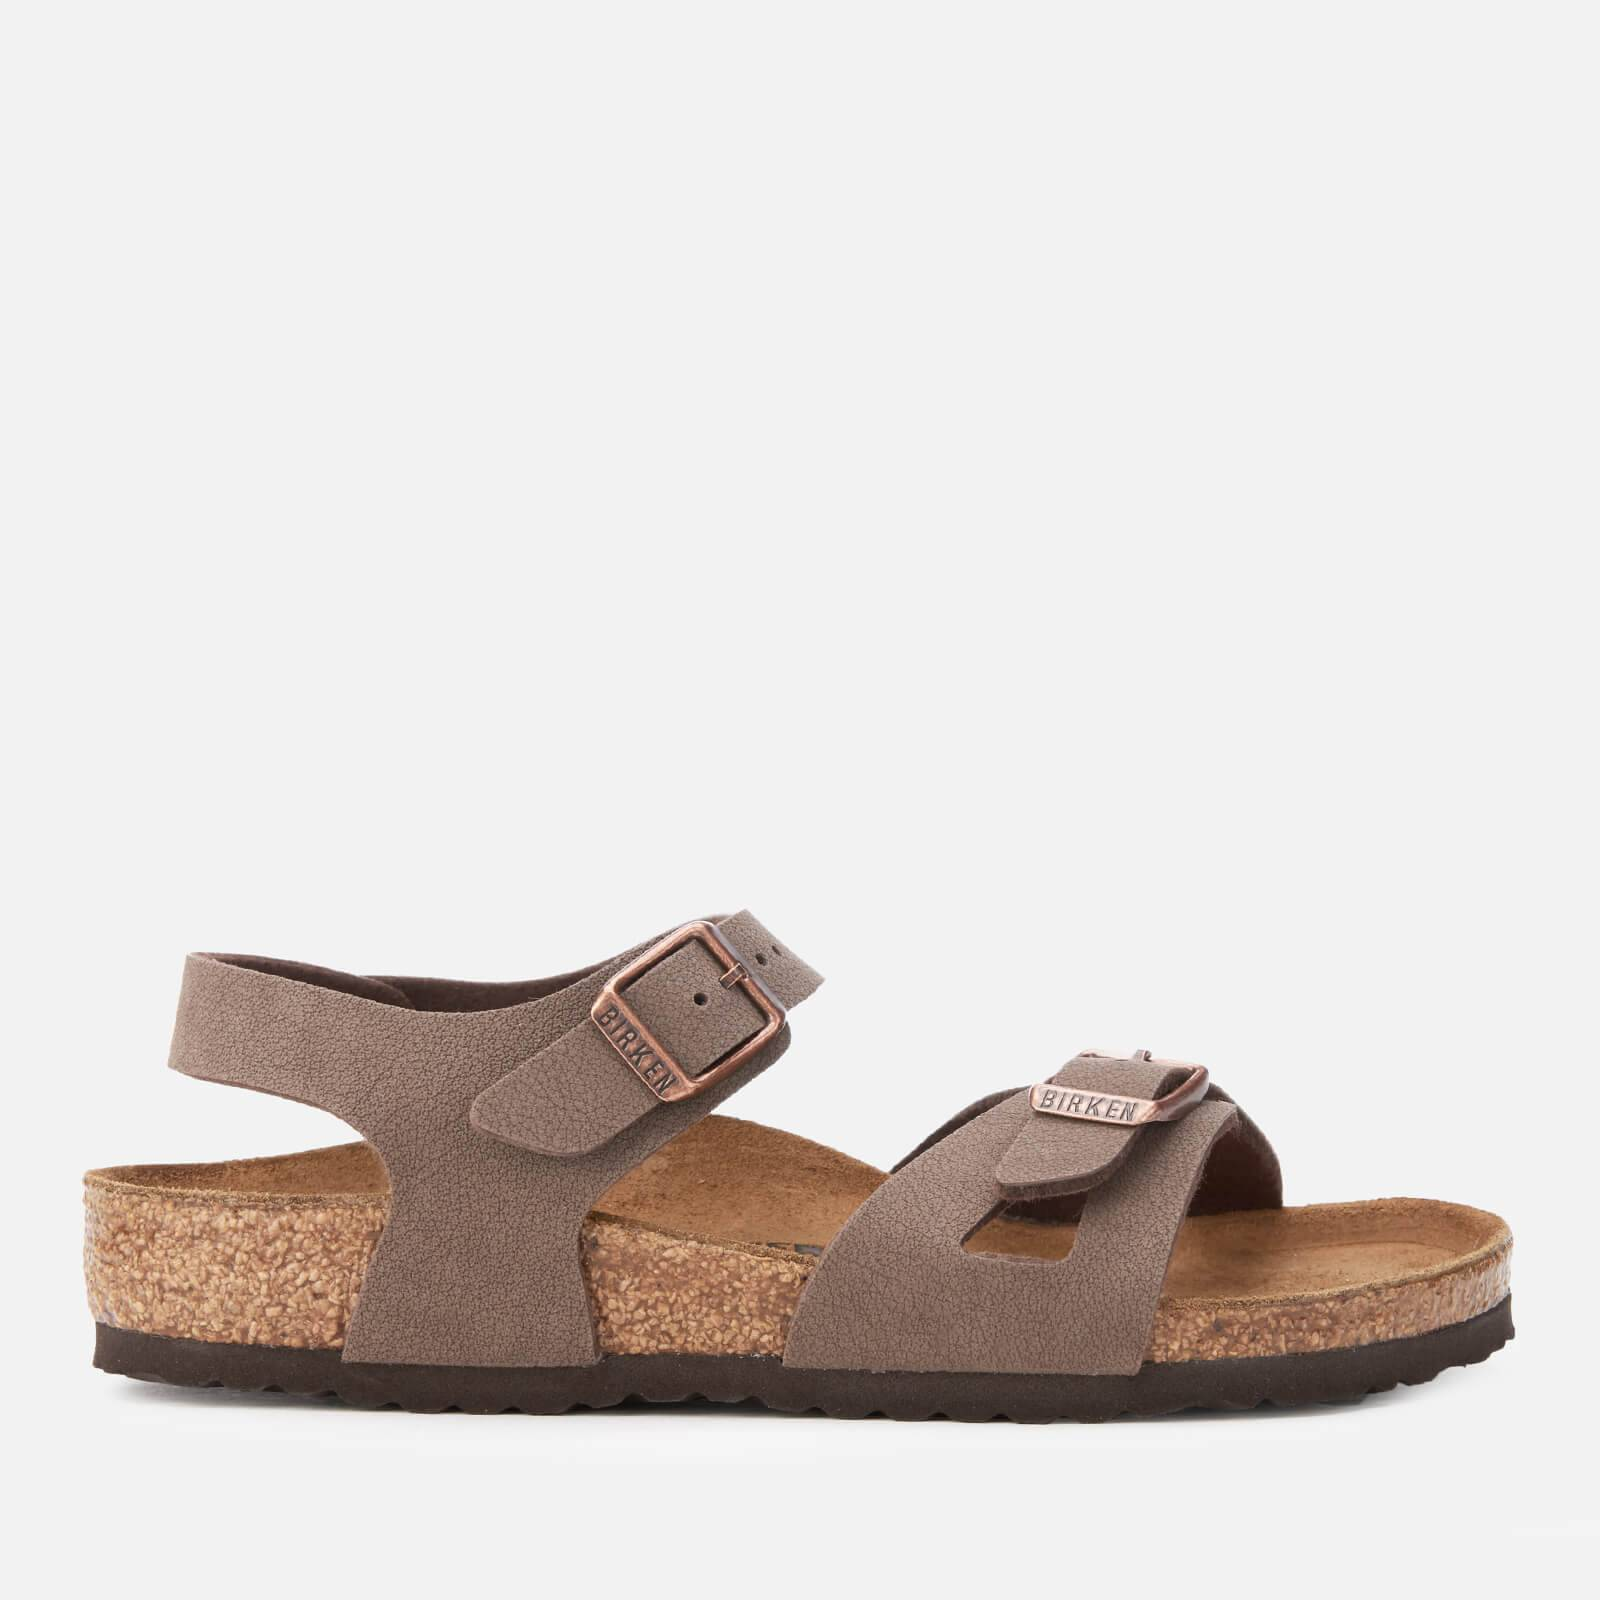 Birkenstock Kids' Rio Slim Fit Double Strap Sandals - Mocha - EU 29/UK 11